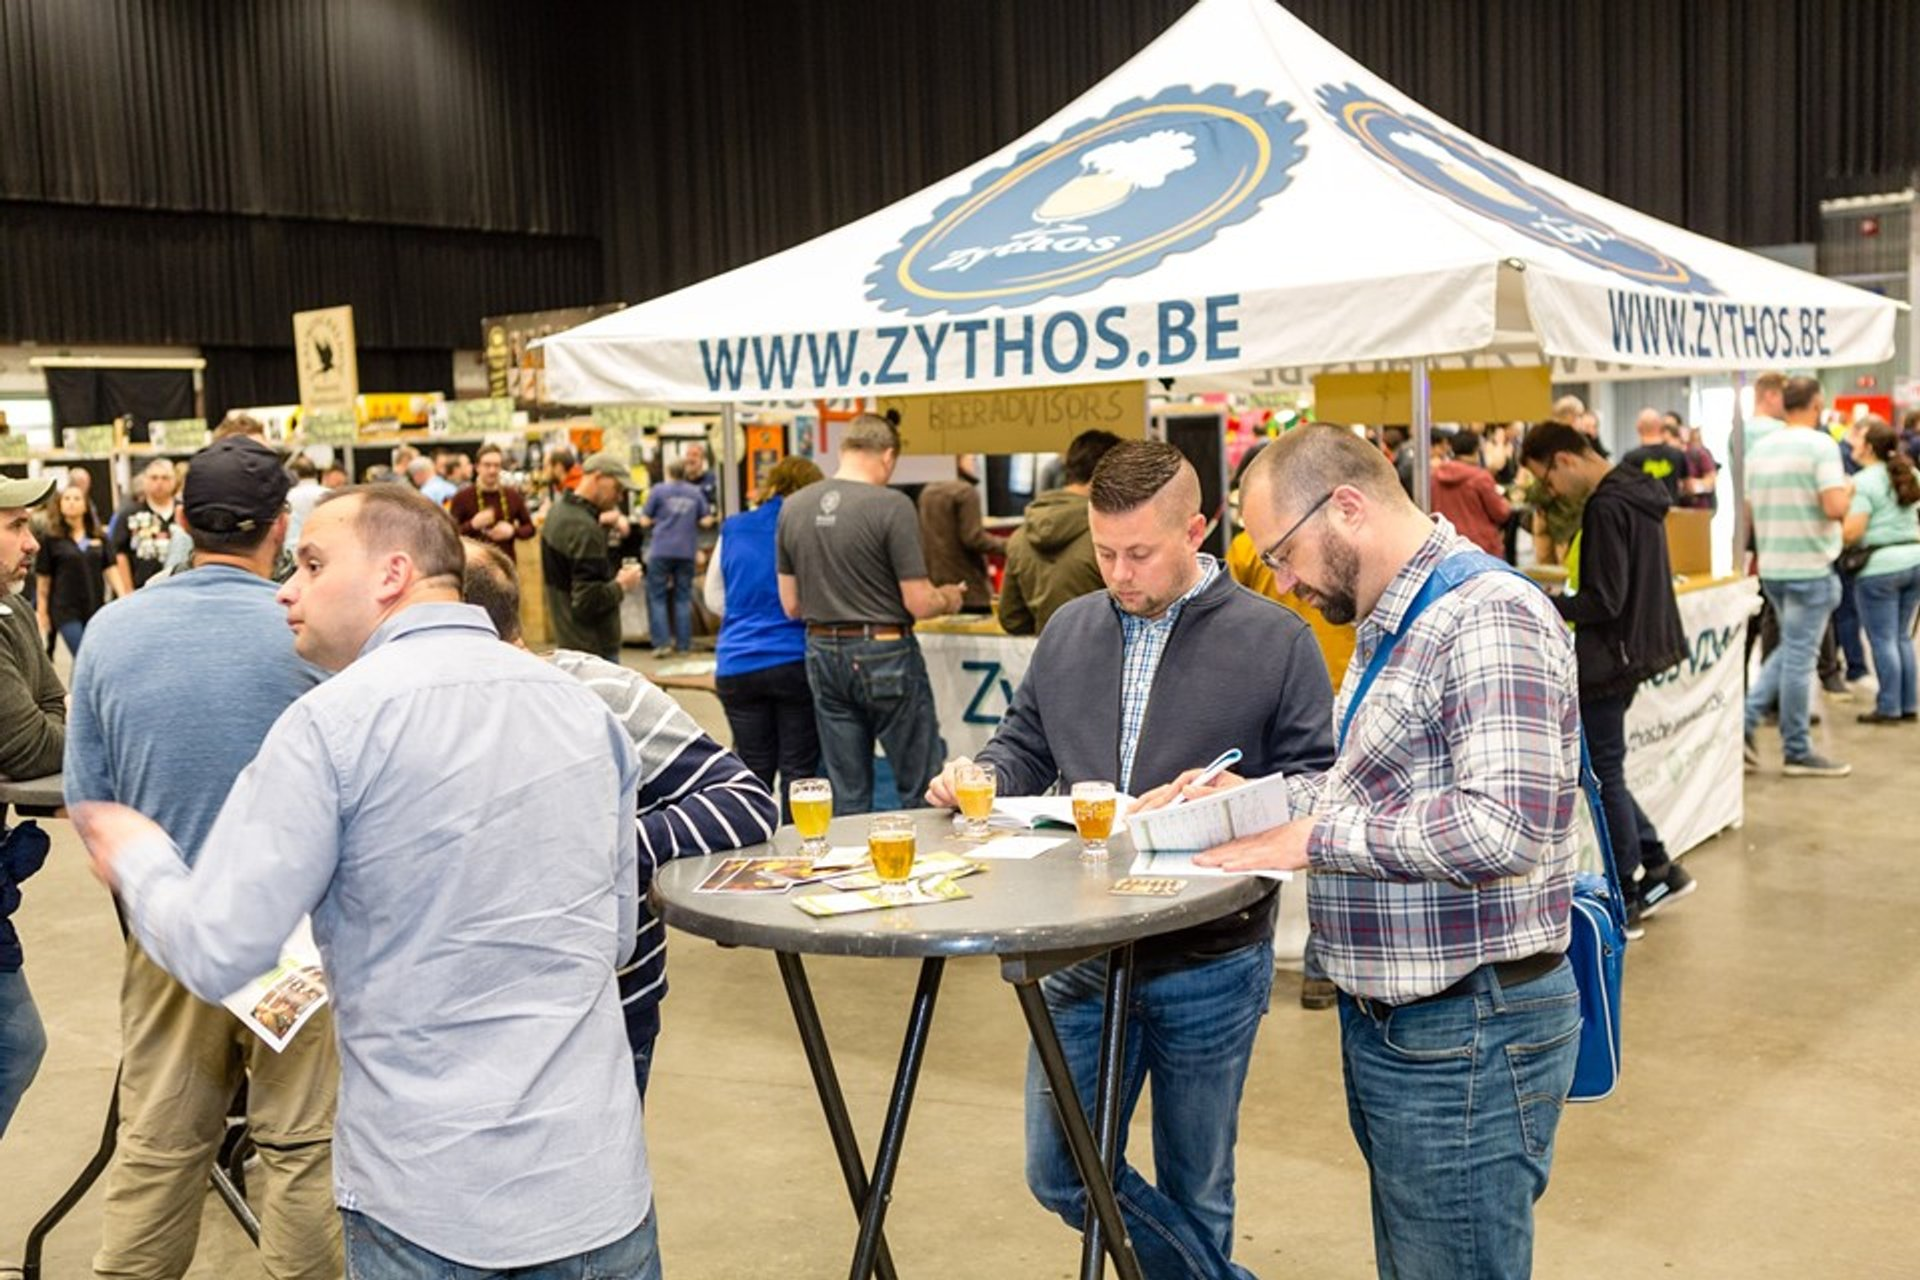 Zythos Beer Festival in Belgium 2020 - Best Time